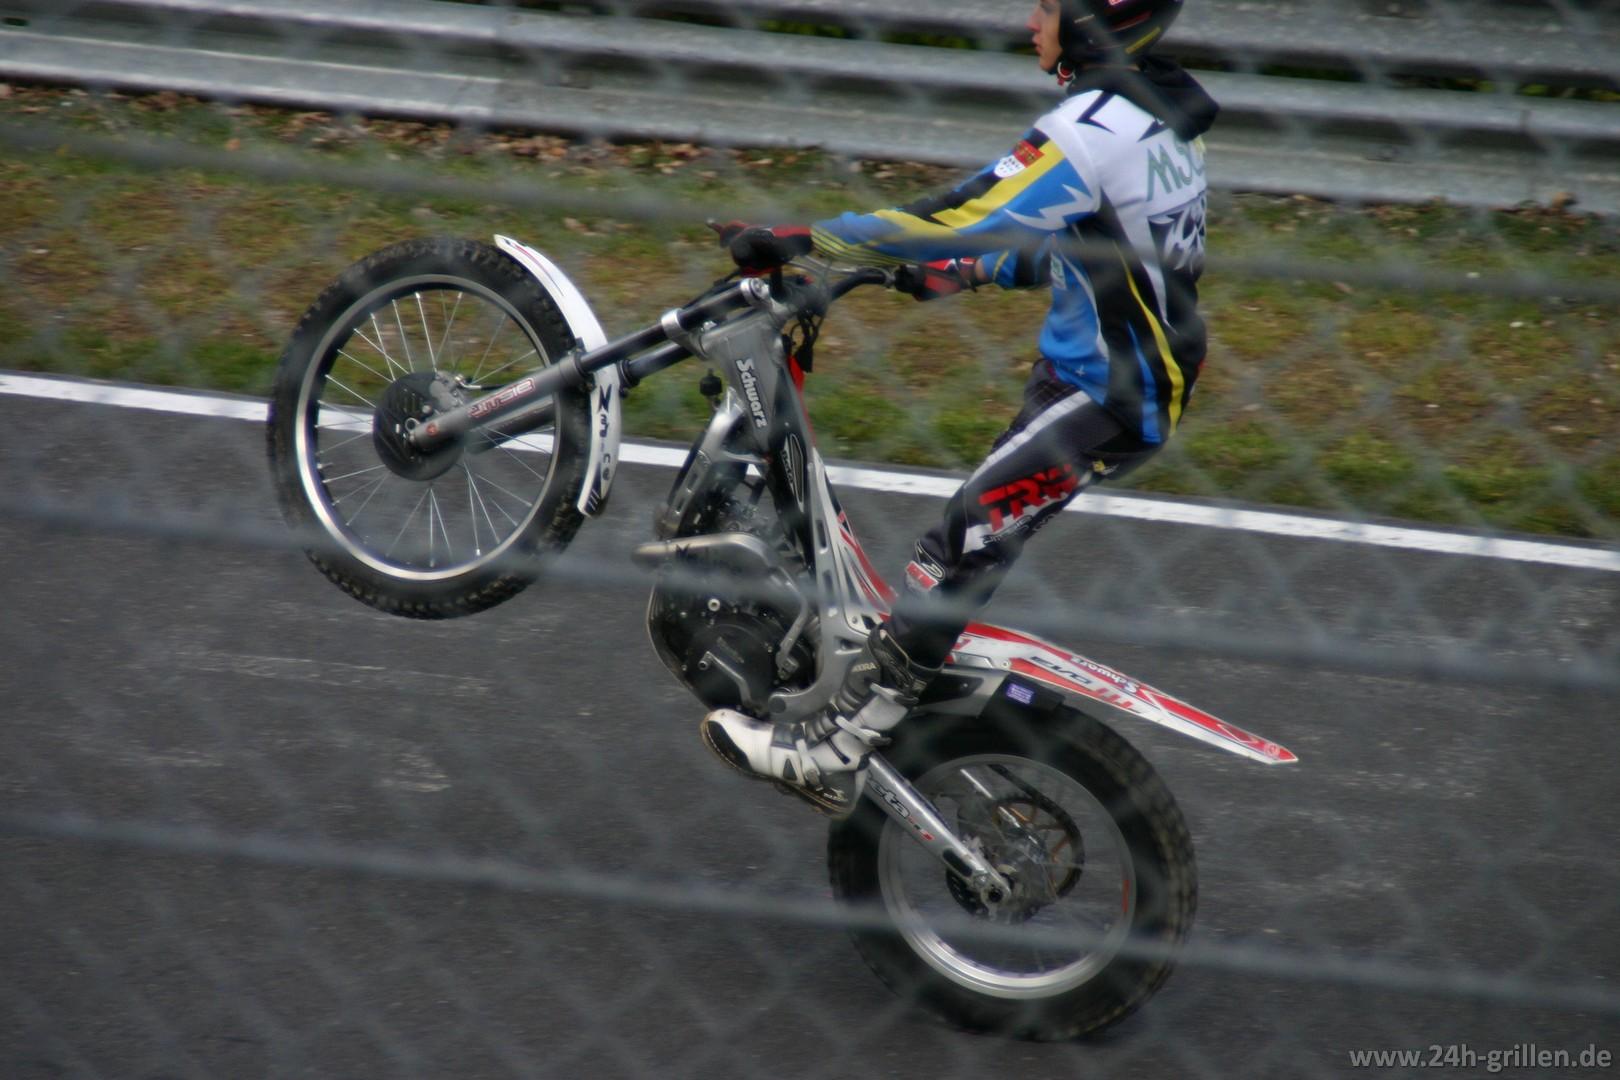 IMG_2010 (212)